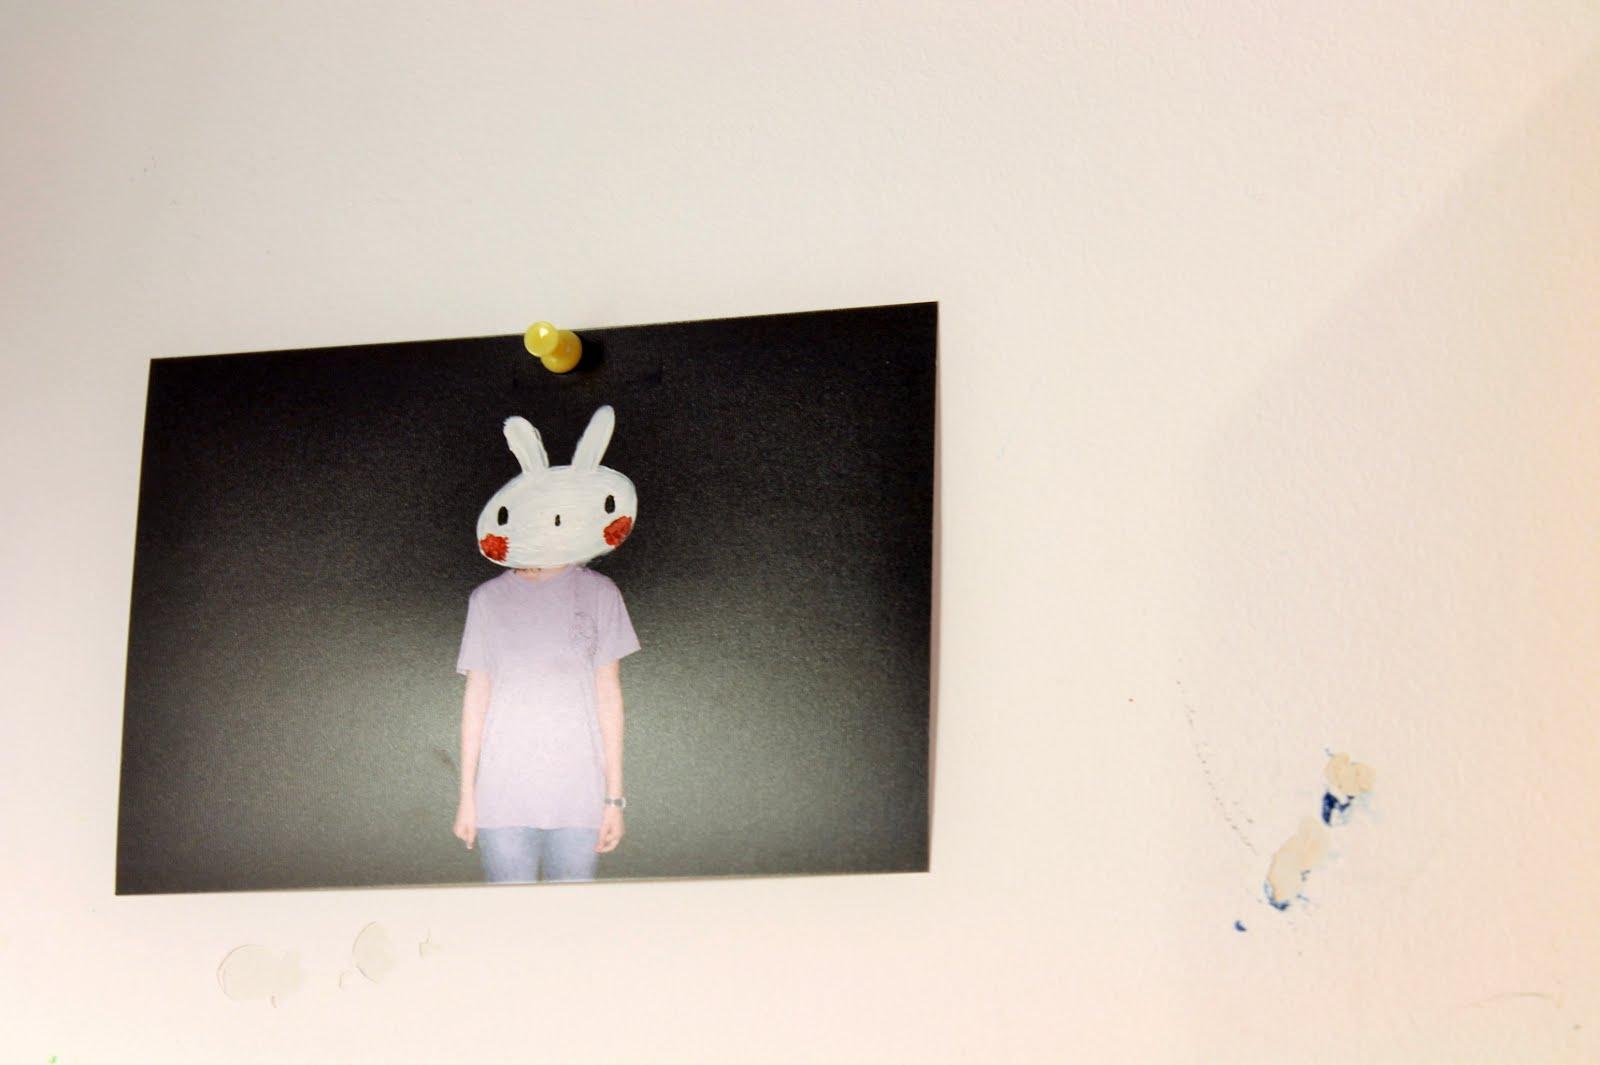 pintar conejo fotografia